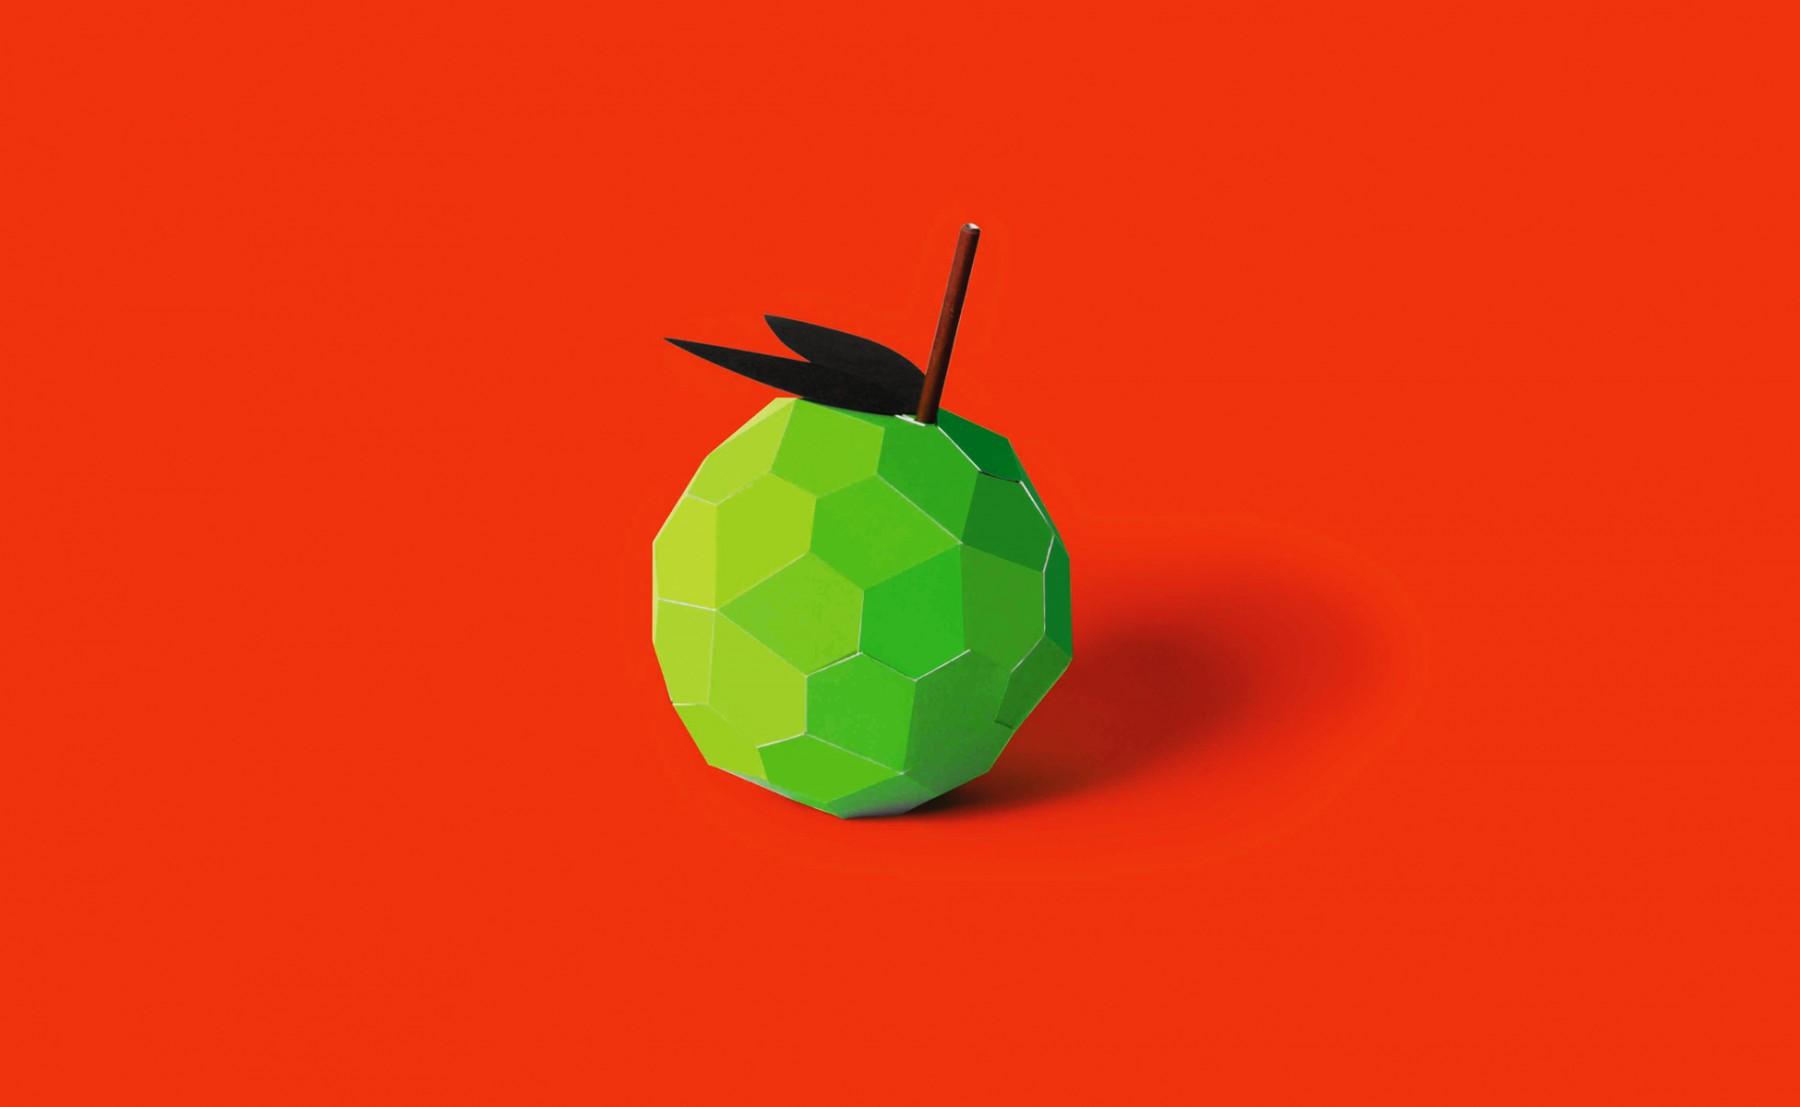 pomme-paper-apple-orange